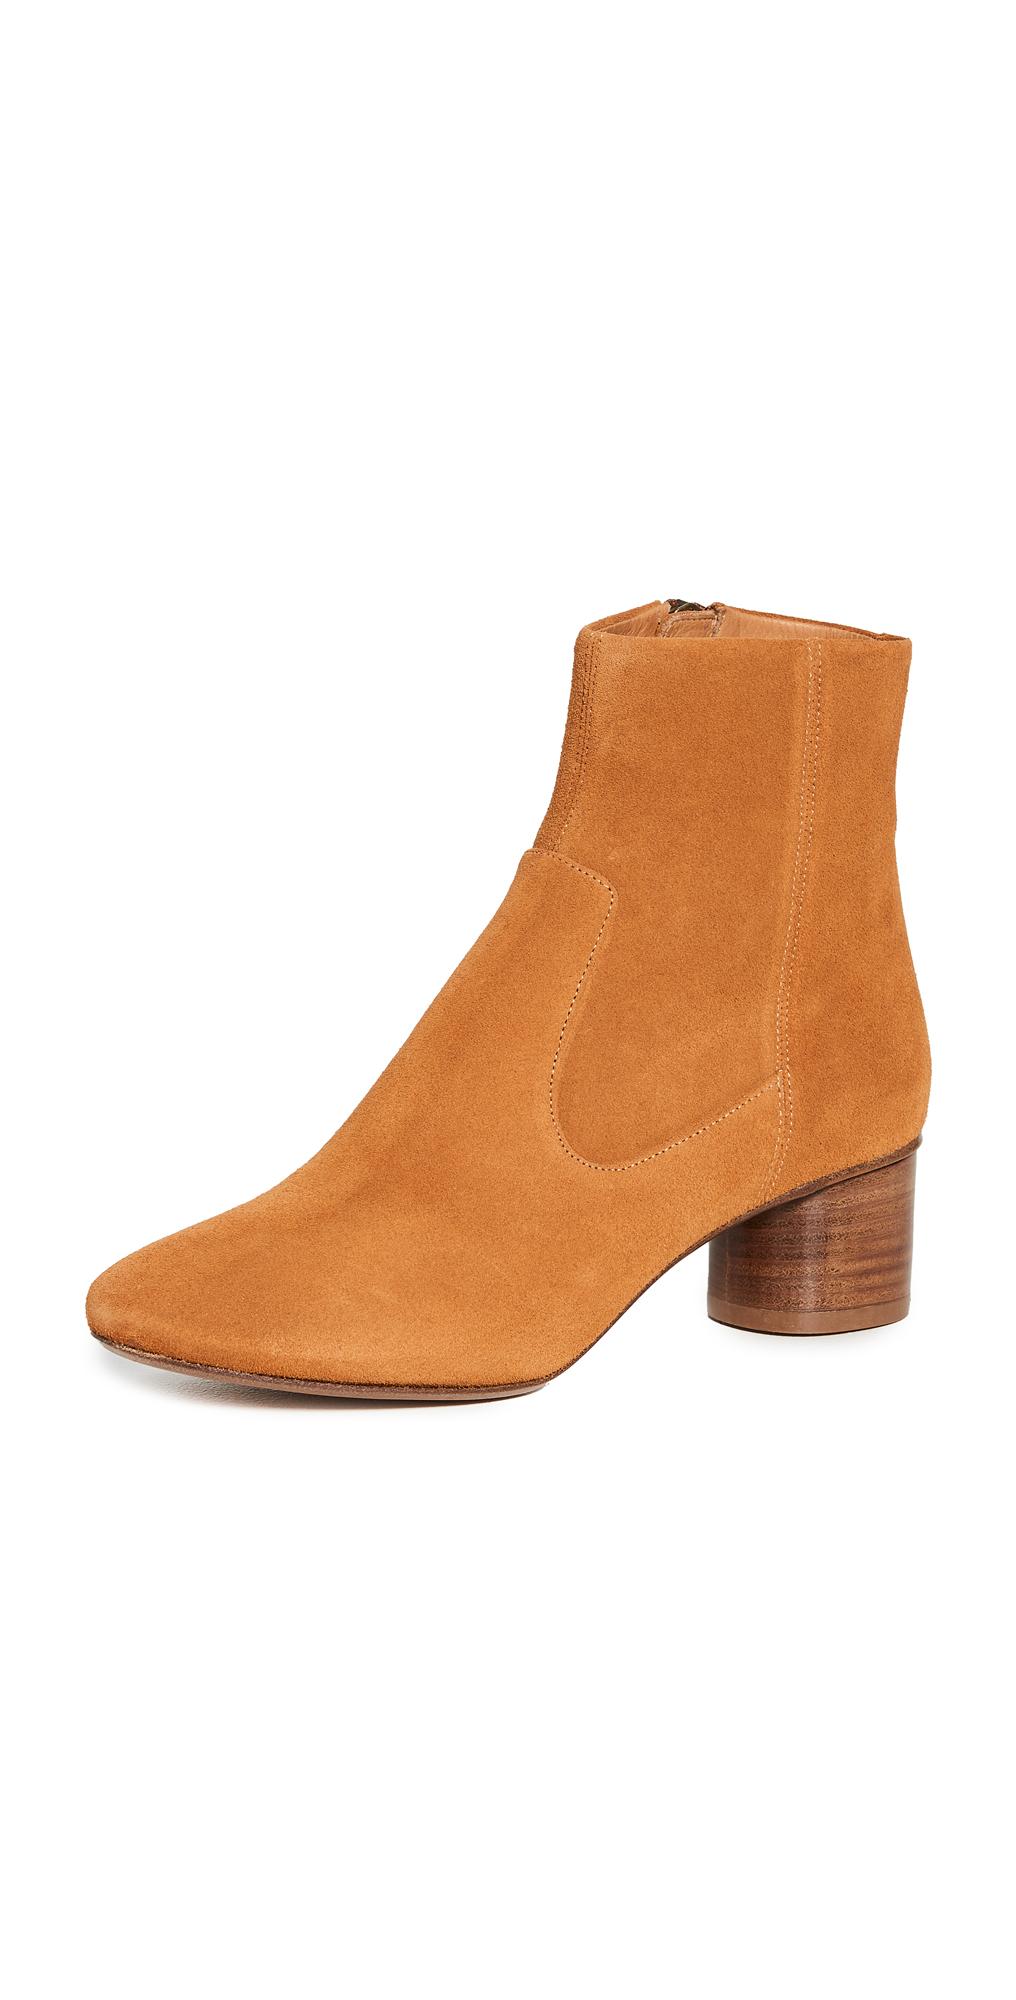 Isabel Marant Dusta Boots